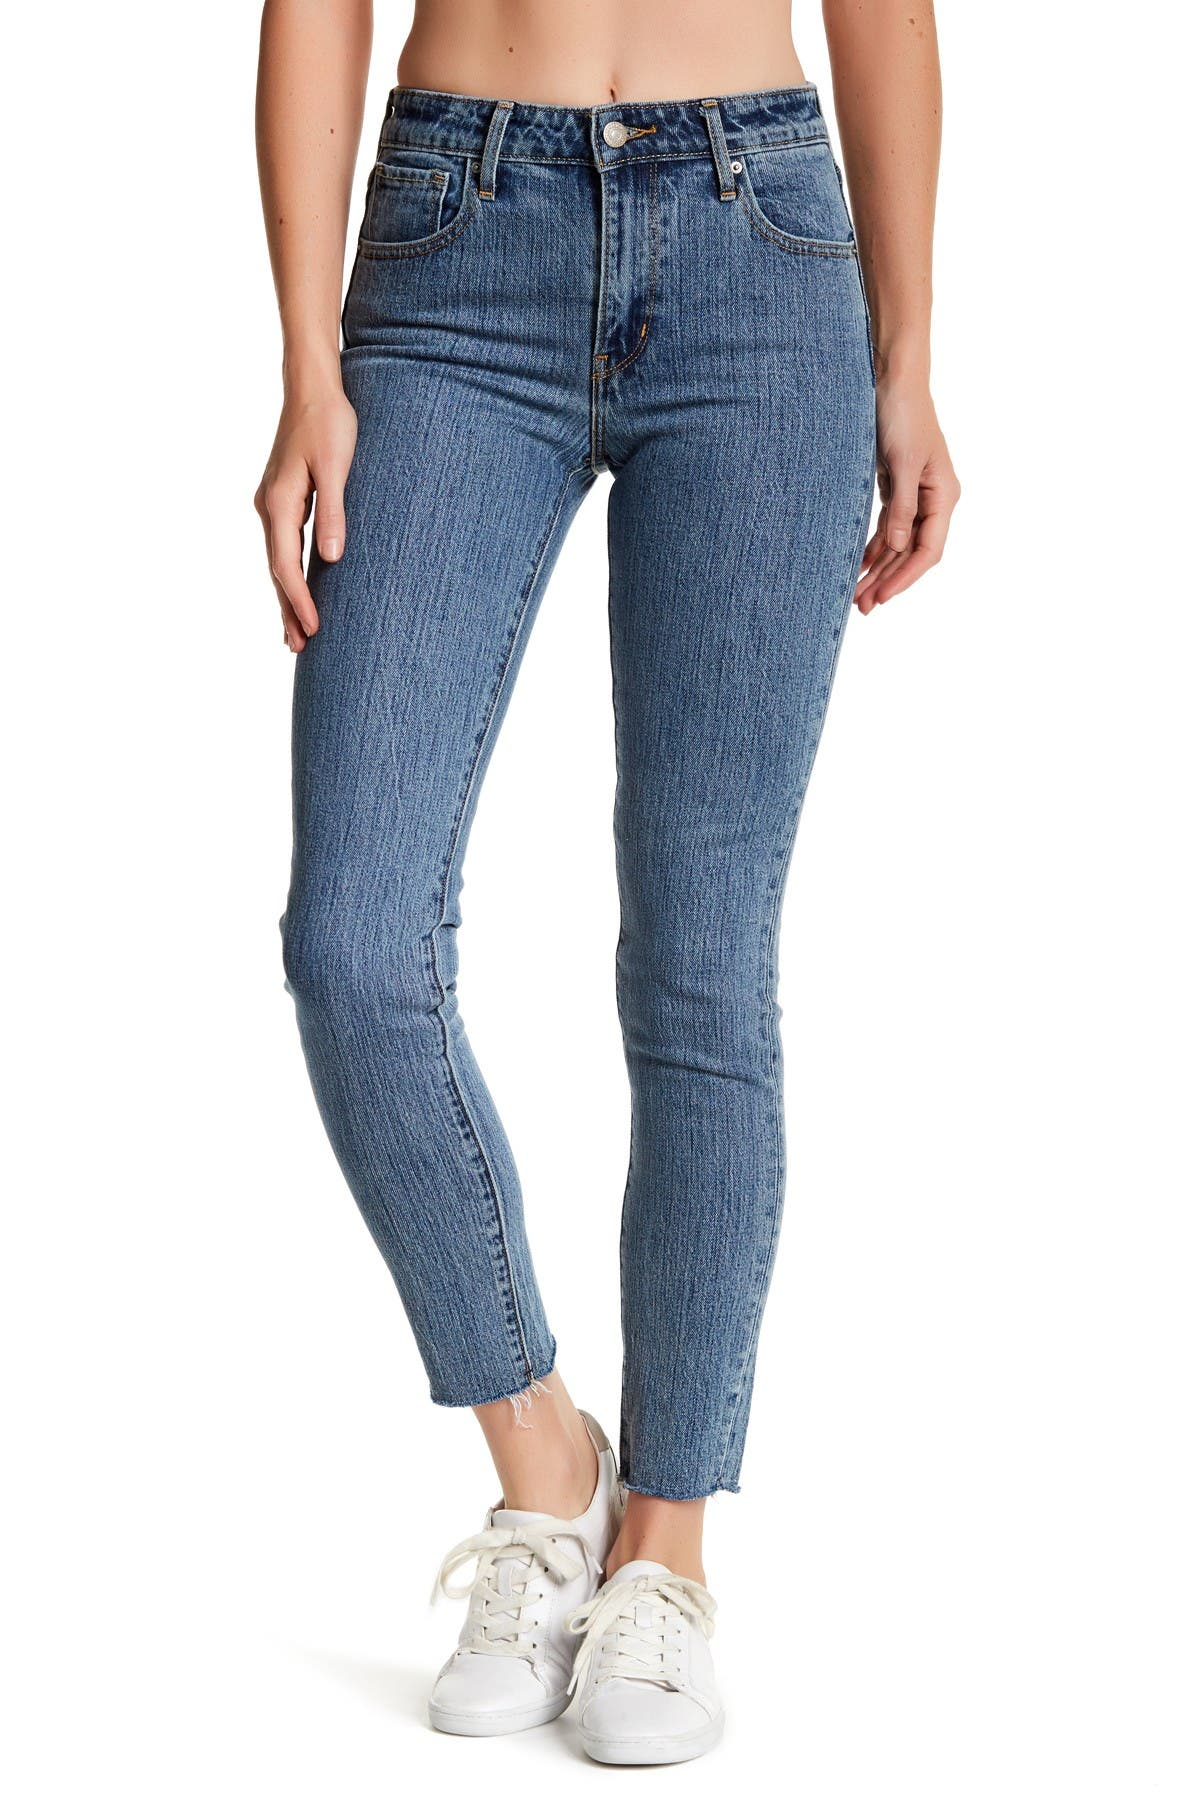 "Image of Levi's 721 High Rise Raw Hem Skinny Jean - 30-32"" Inseam"